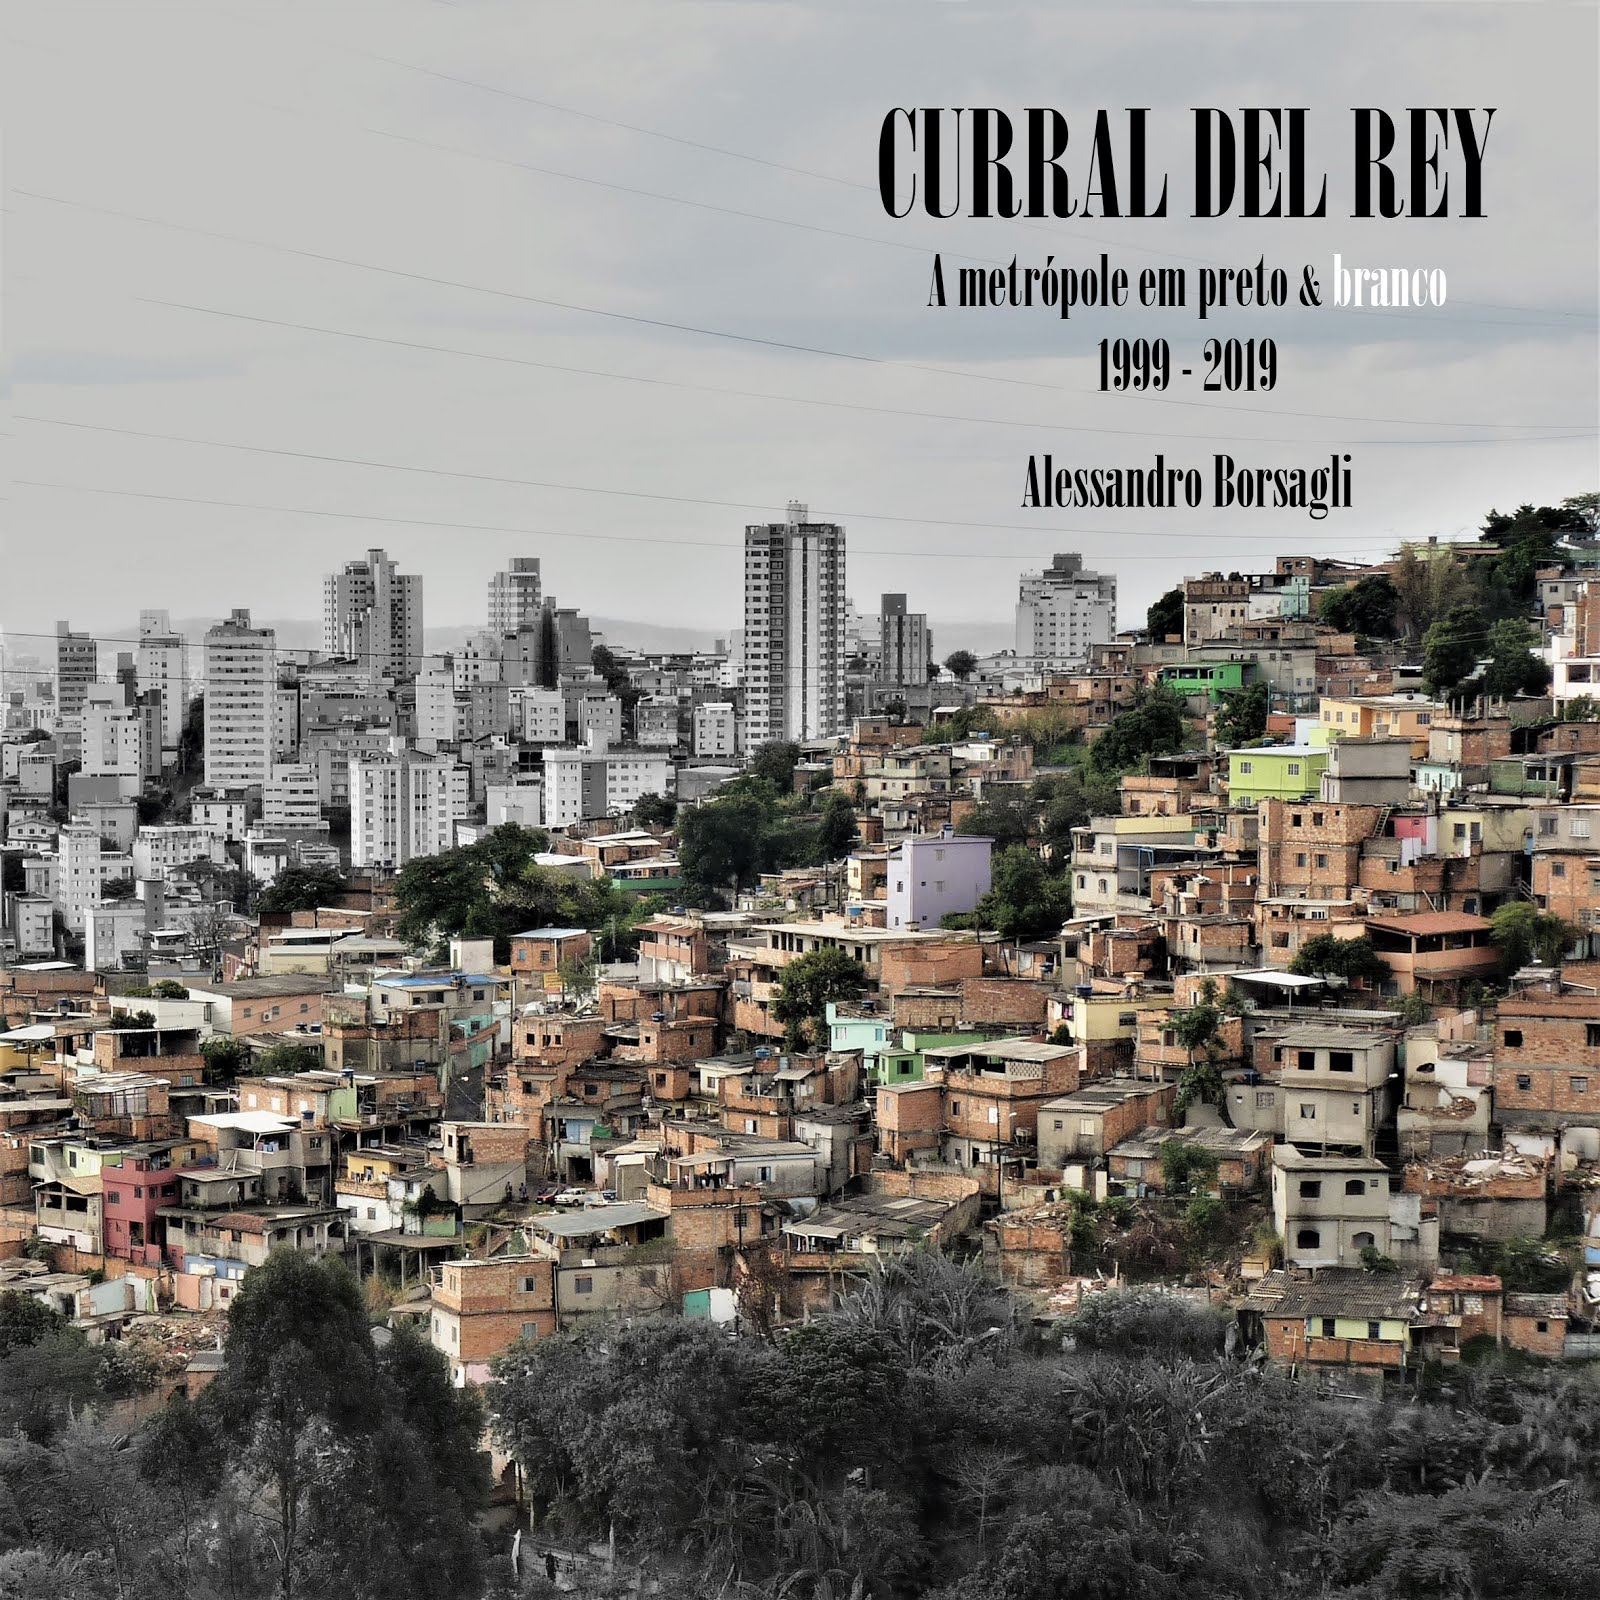 Livro Curral del Rey (1999/2019)